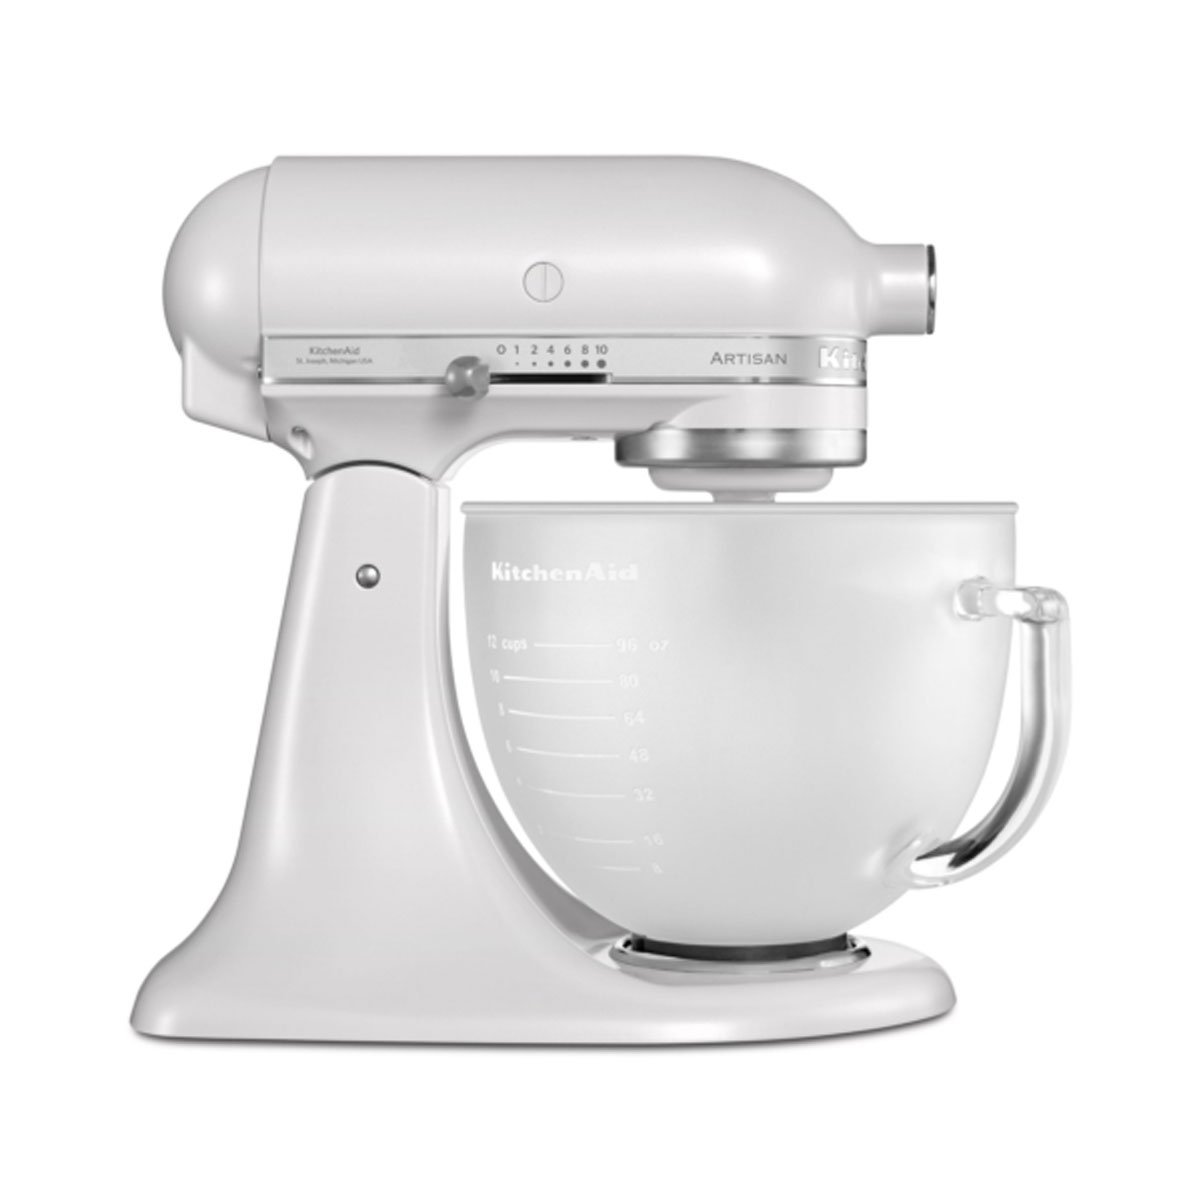 KitchenAid-5KSM156EFP-Kchenmaschine-mit-kippbarem-Motorkopf-SerieArtisan-Frosted-Pearl